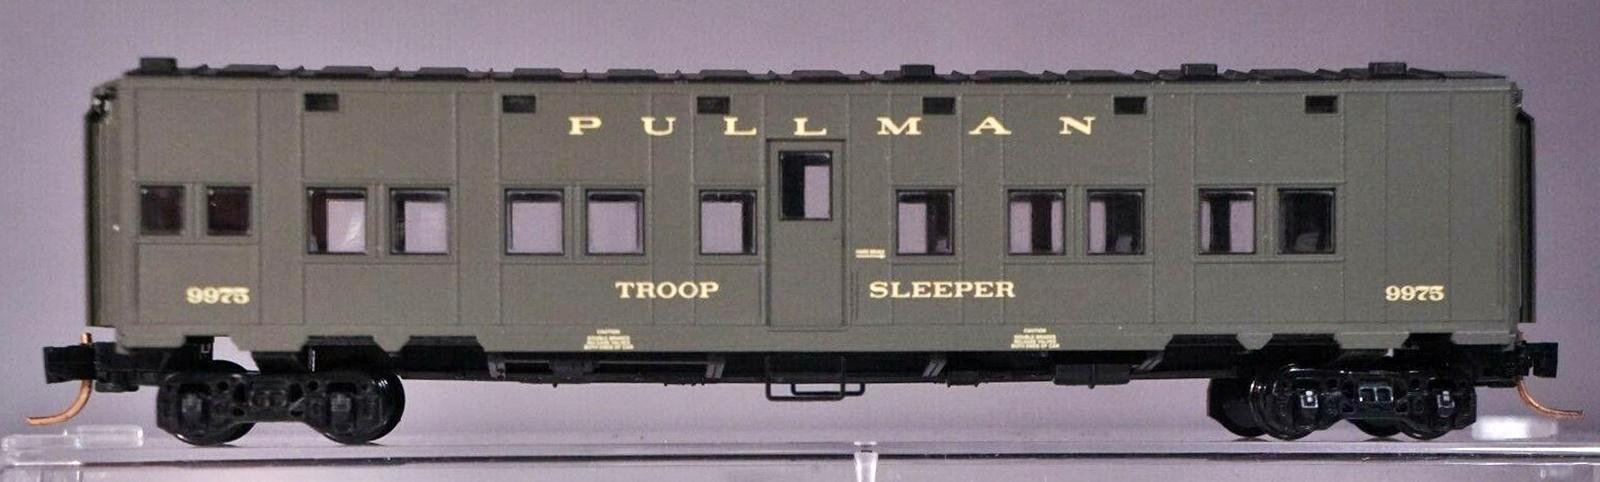 N Scale - Micro-Trains - 116 50 012 - Passenger Car, Troop Transport - Pullman - 9975